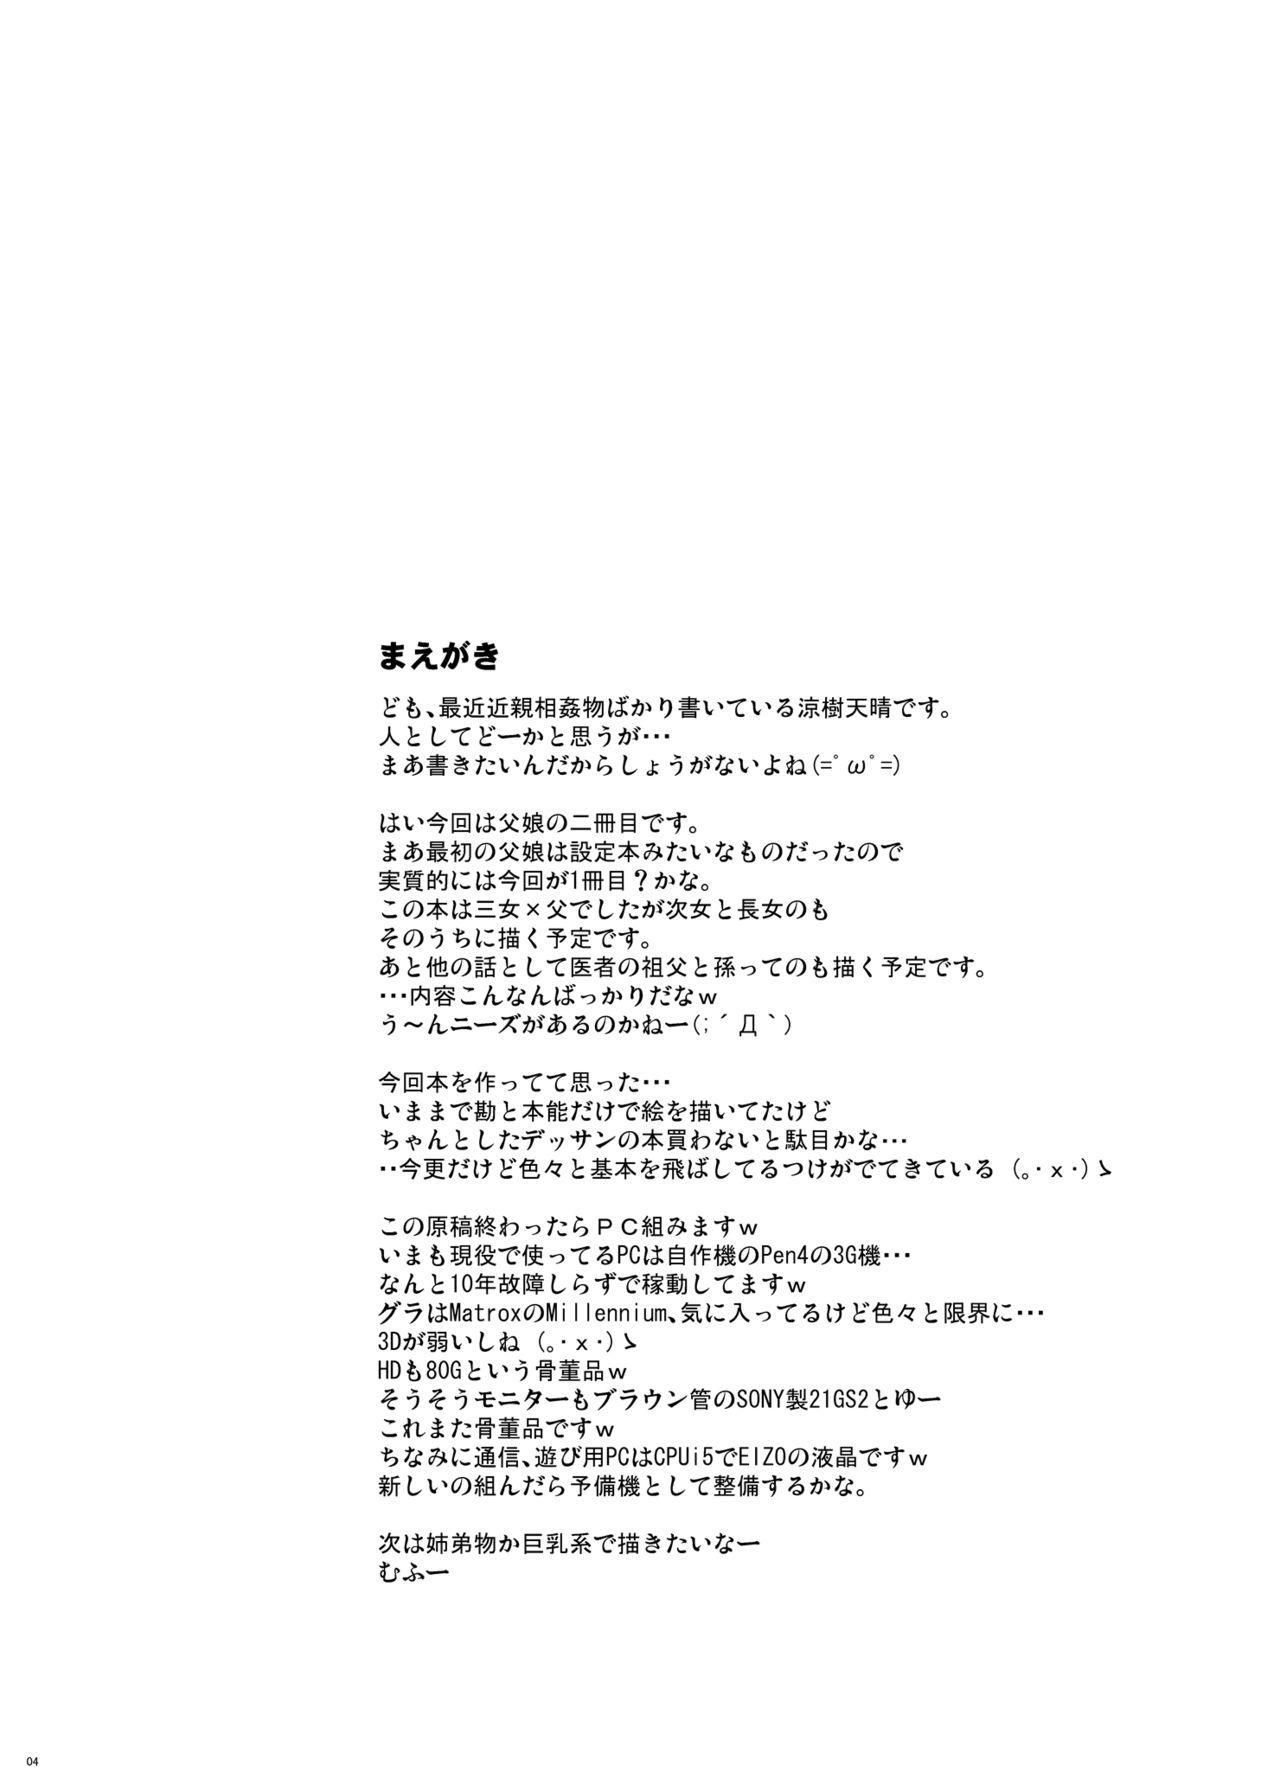 Oyako Suemusume Chichioya Kyoushuu Hen 3